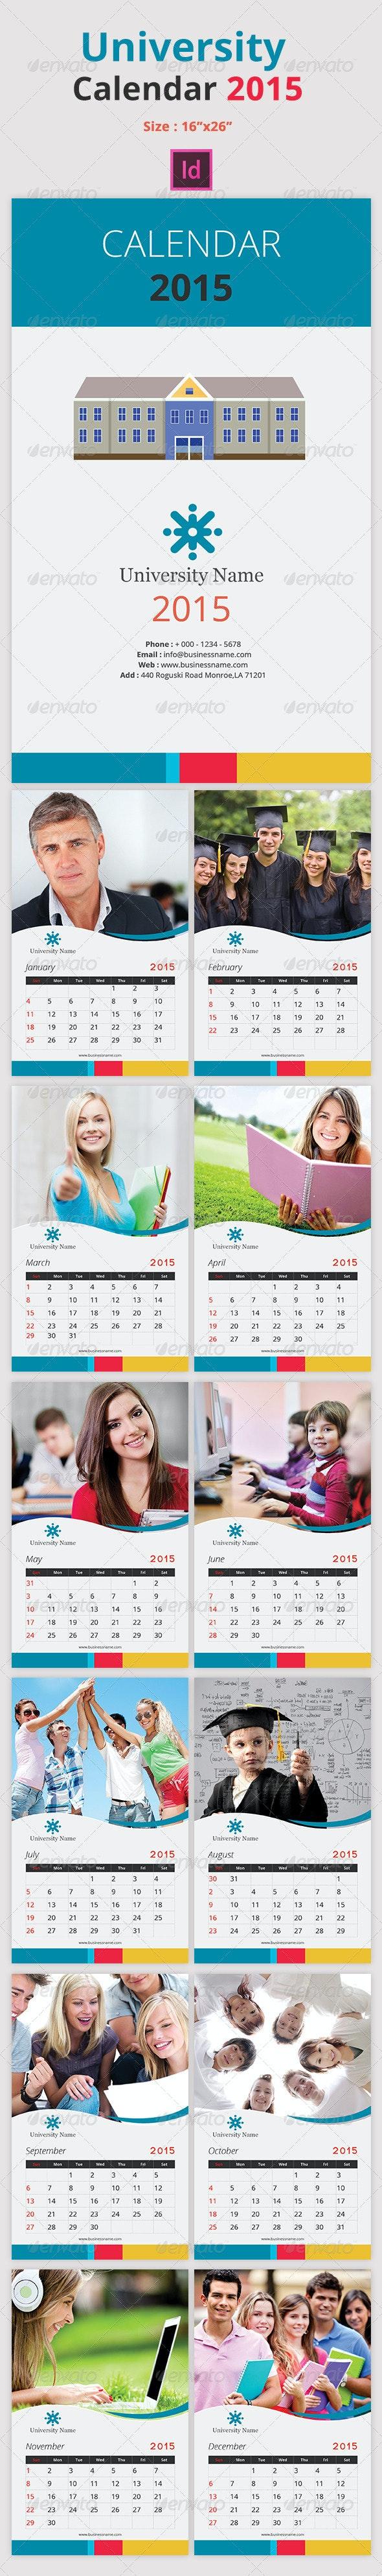 University Calendar 2015 - Calendars Stationery